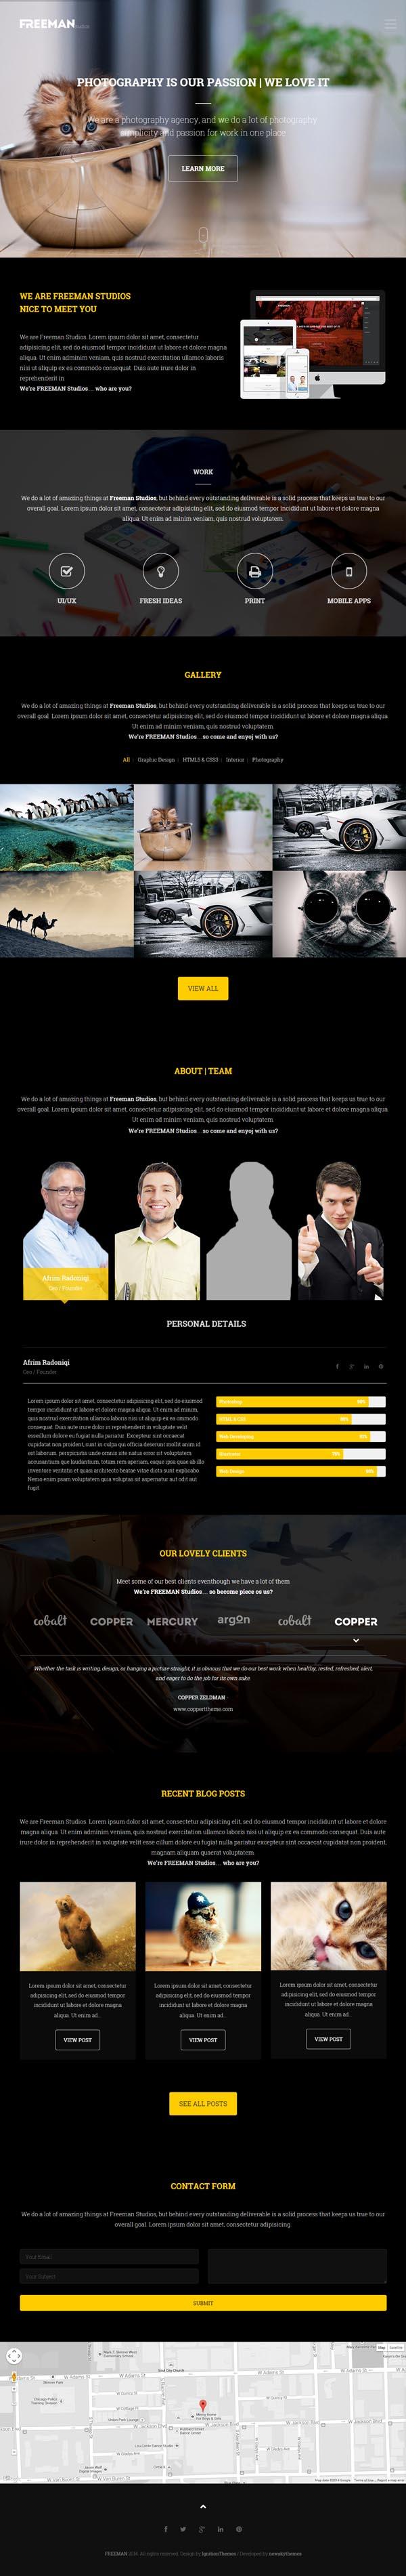 Freeman – Responsive One Page WordPress Theme